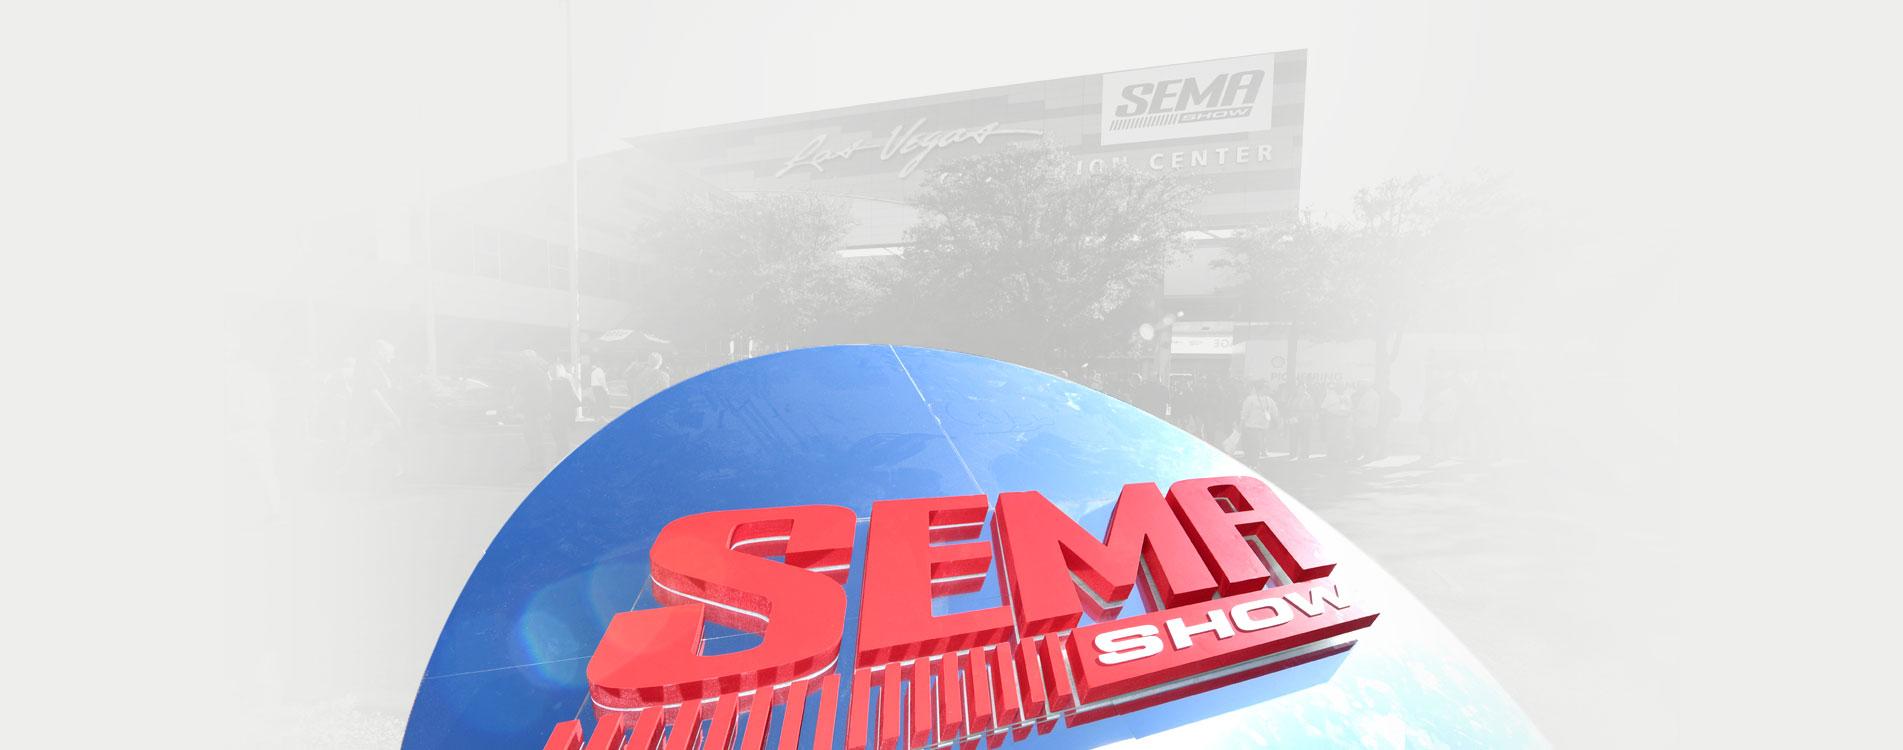 Sema-banner